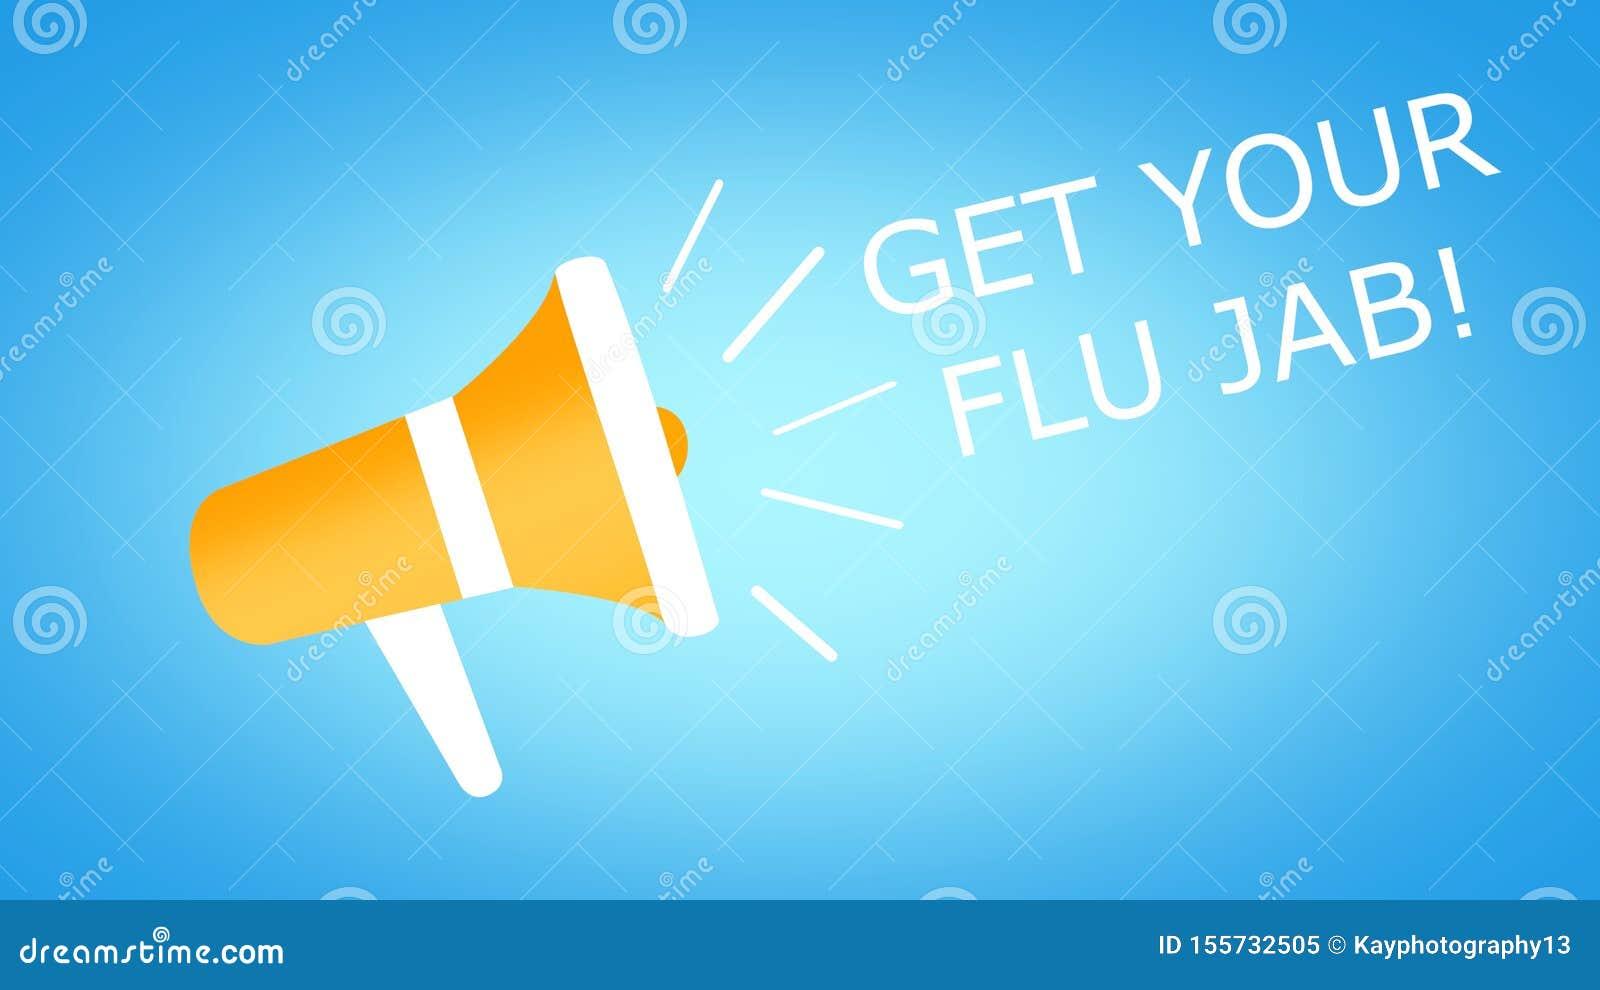 Flu Awareness Campaign Banner Design Illustration Stock Illustration Illustration Of Flushot Care 155732505